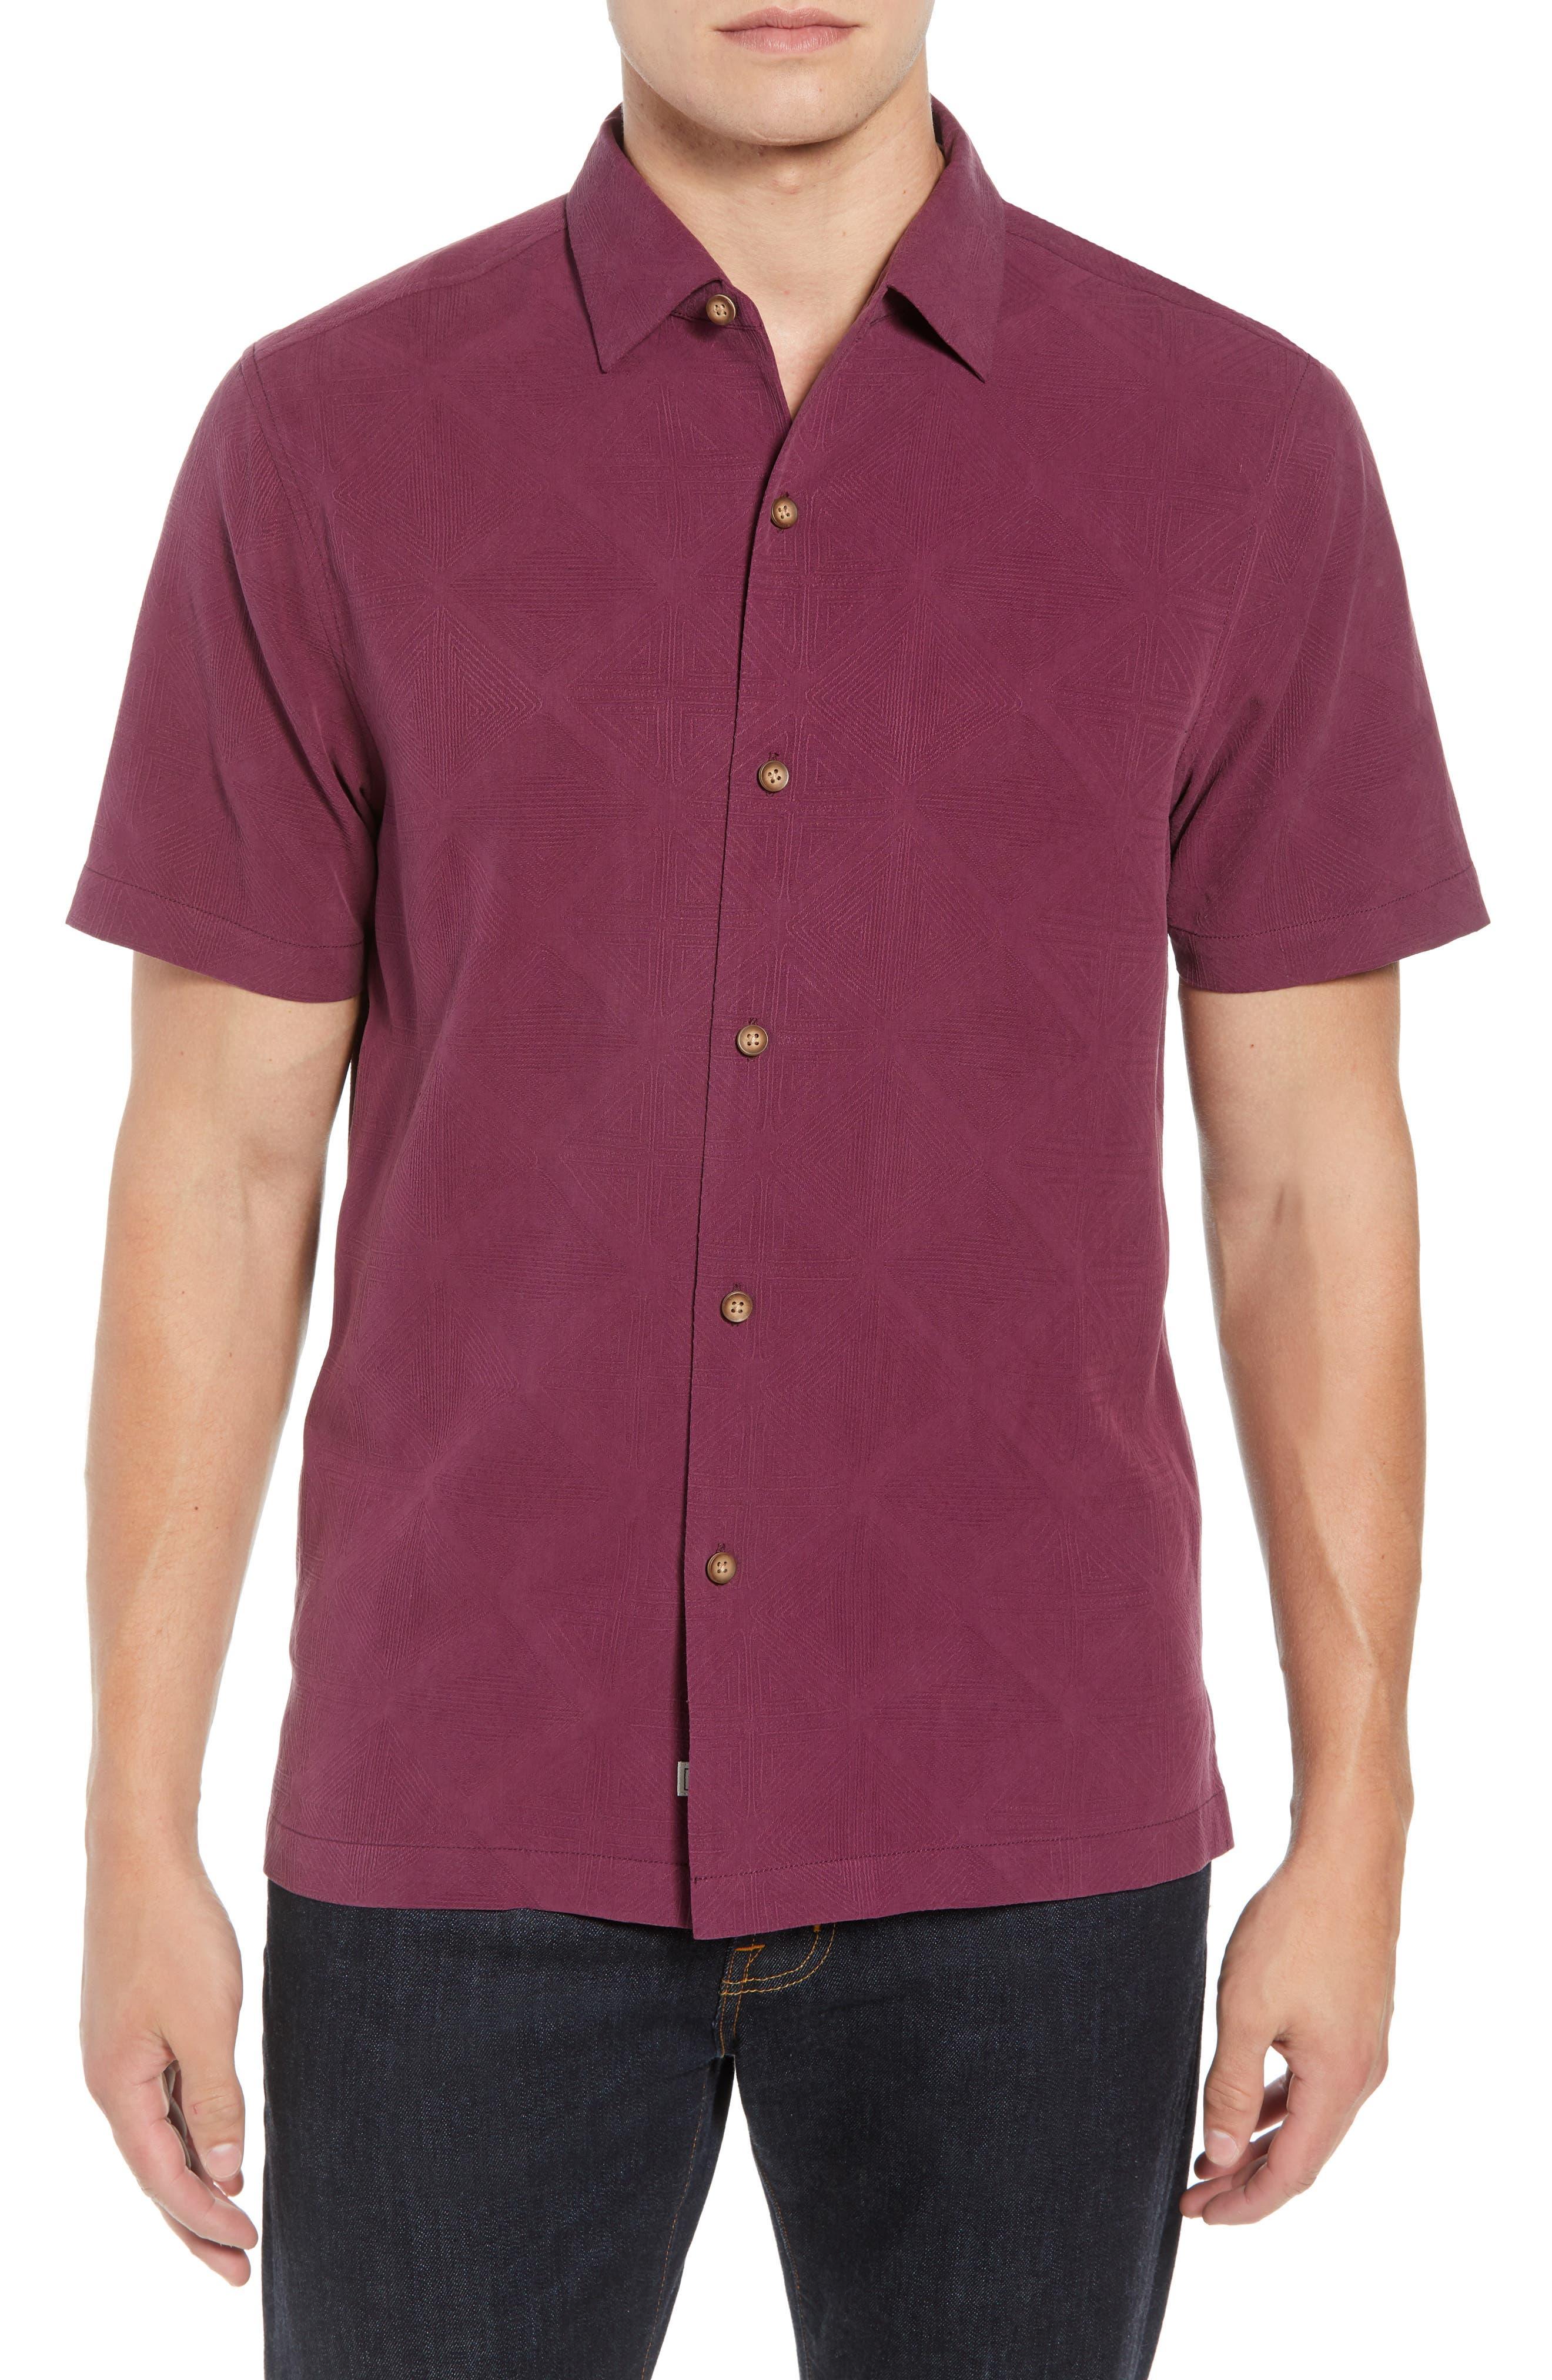 Pura Vino Embroidered Silk Sport Shirt,                             Main thumbnail 1, color,                             GRAPE WINE